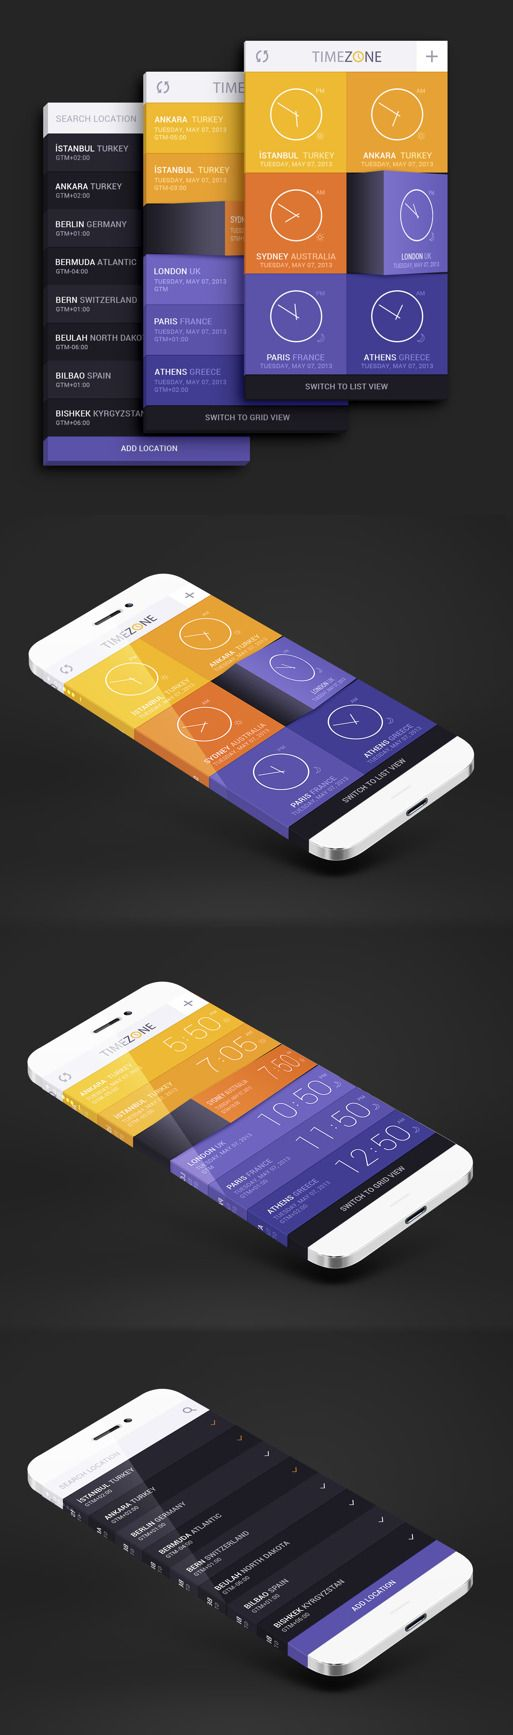 TIME ZONE iPhone app interface by Enes Kırdemir